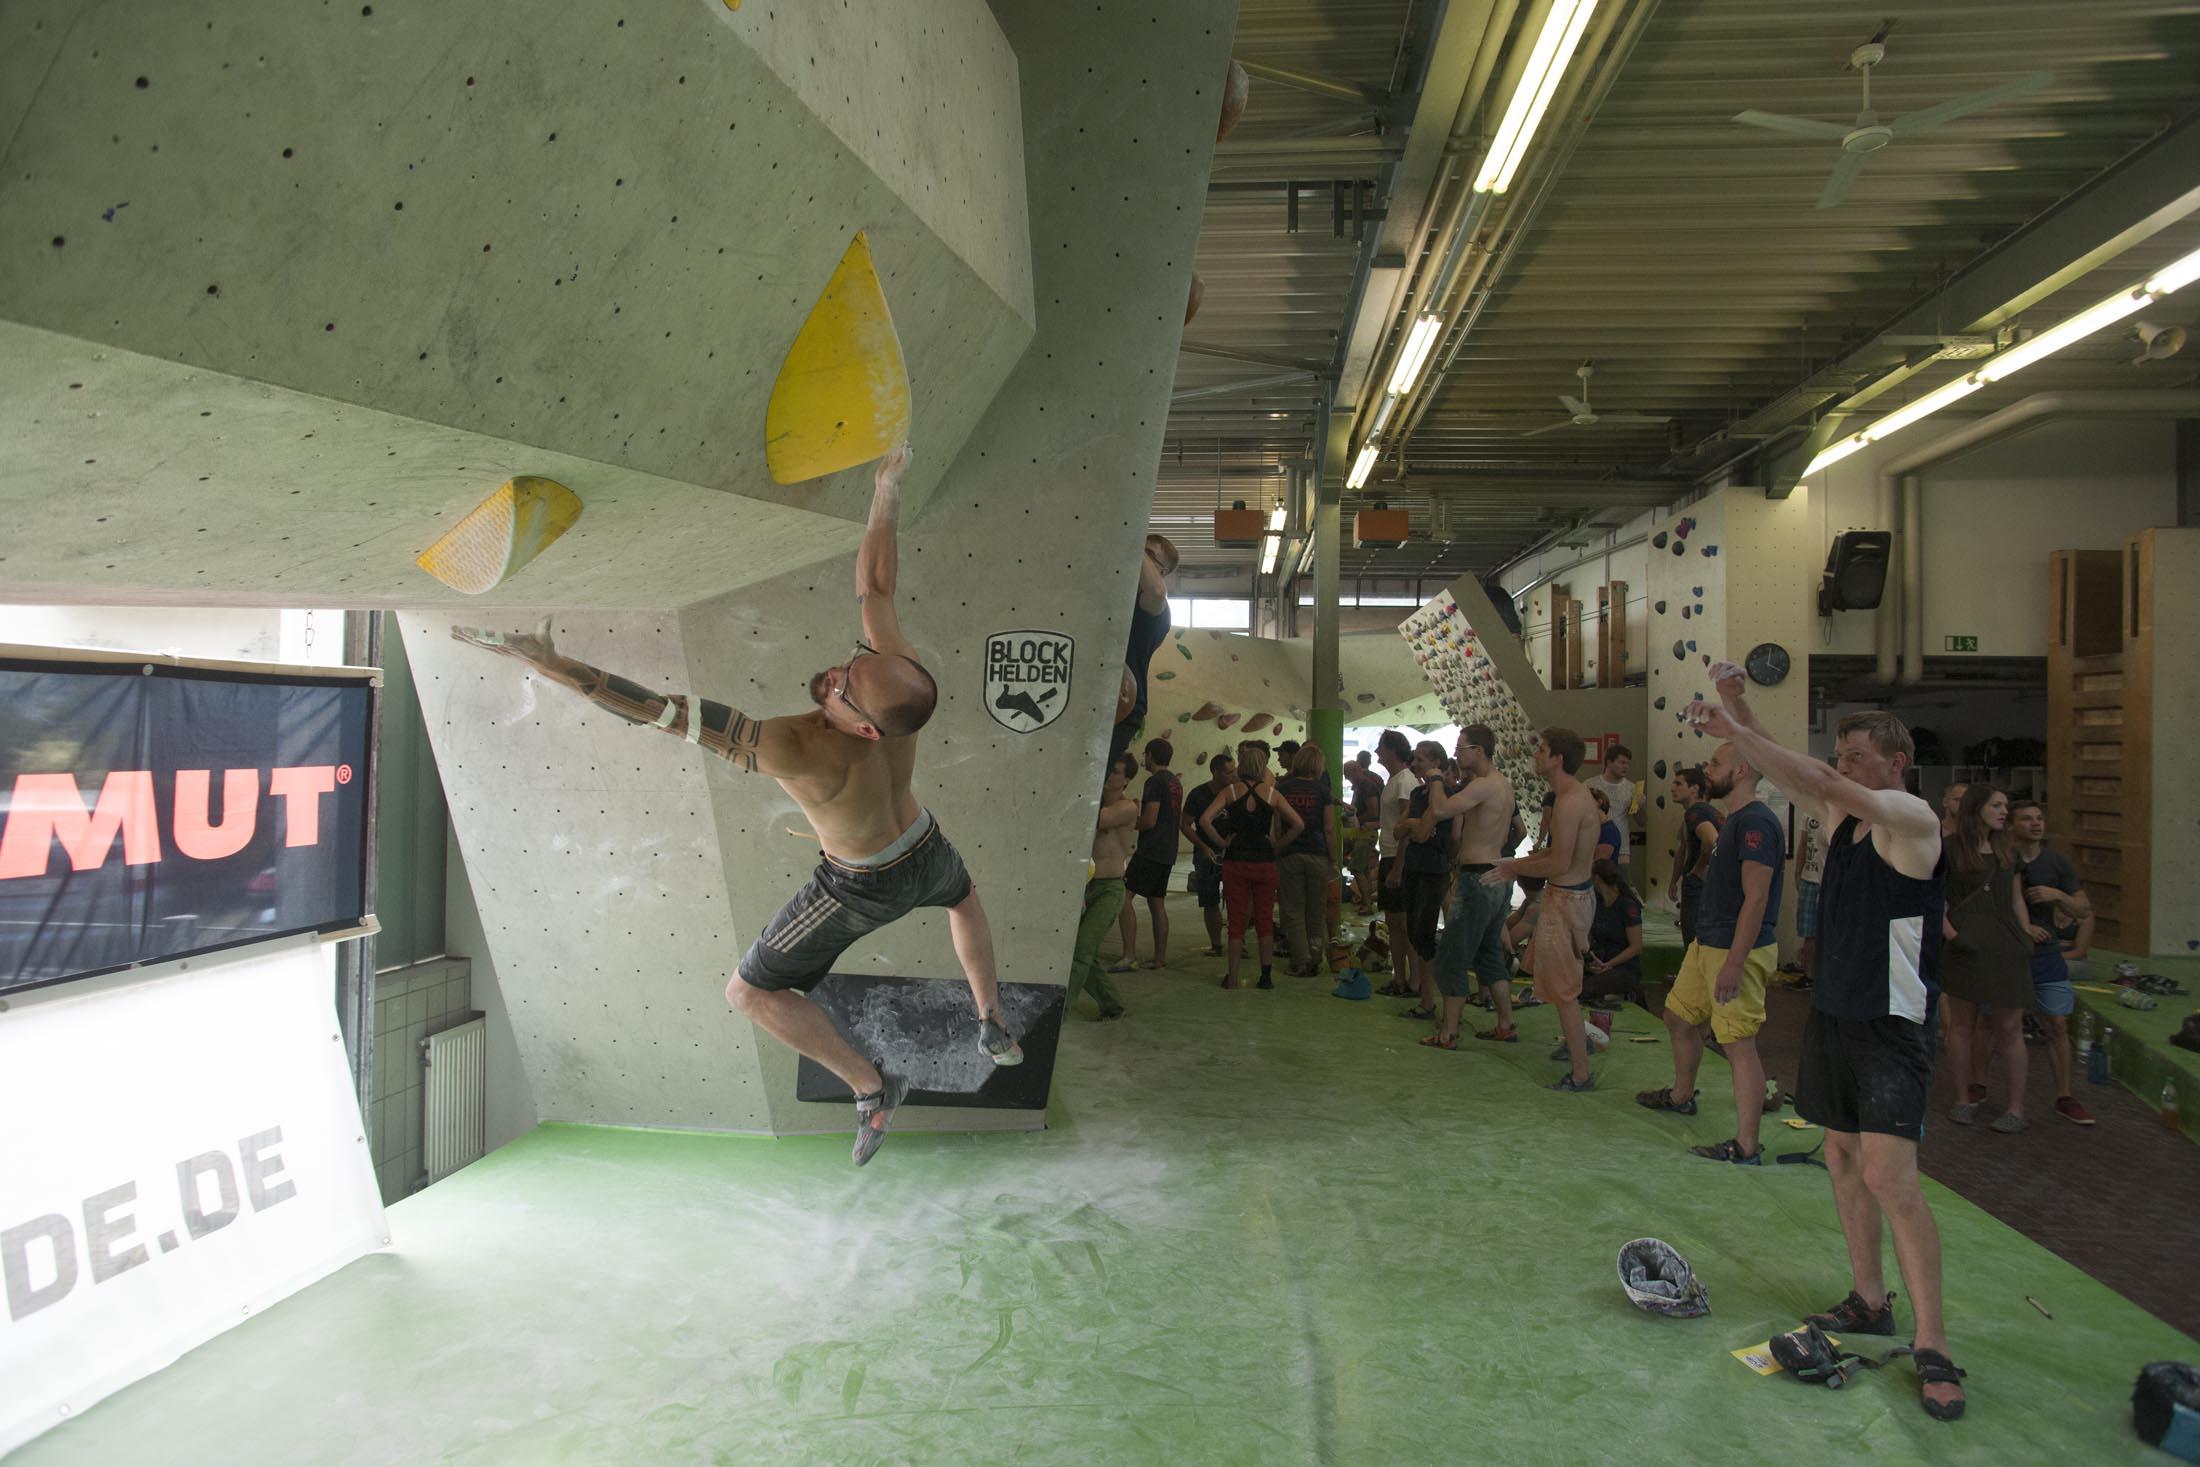 Quali, internationaler bouldercup Frankenjura 2016, BLOCKHELDEN Erlangen, Mammut, Bergfreunde.de, Boulderwettkampf07092016400